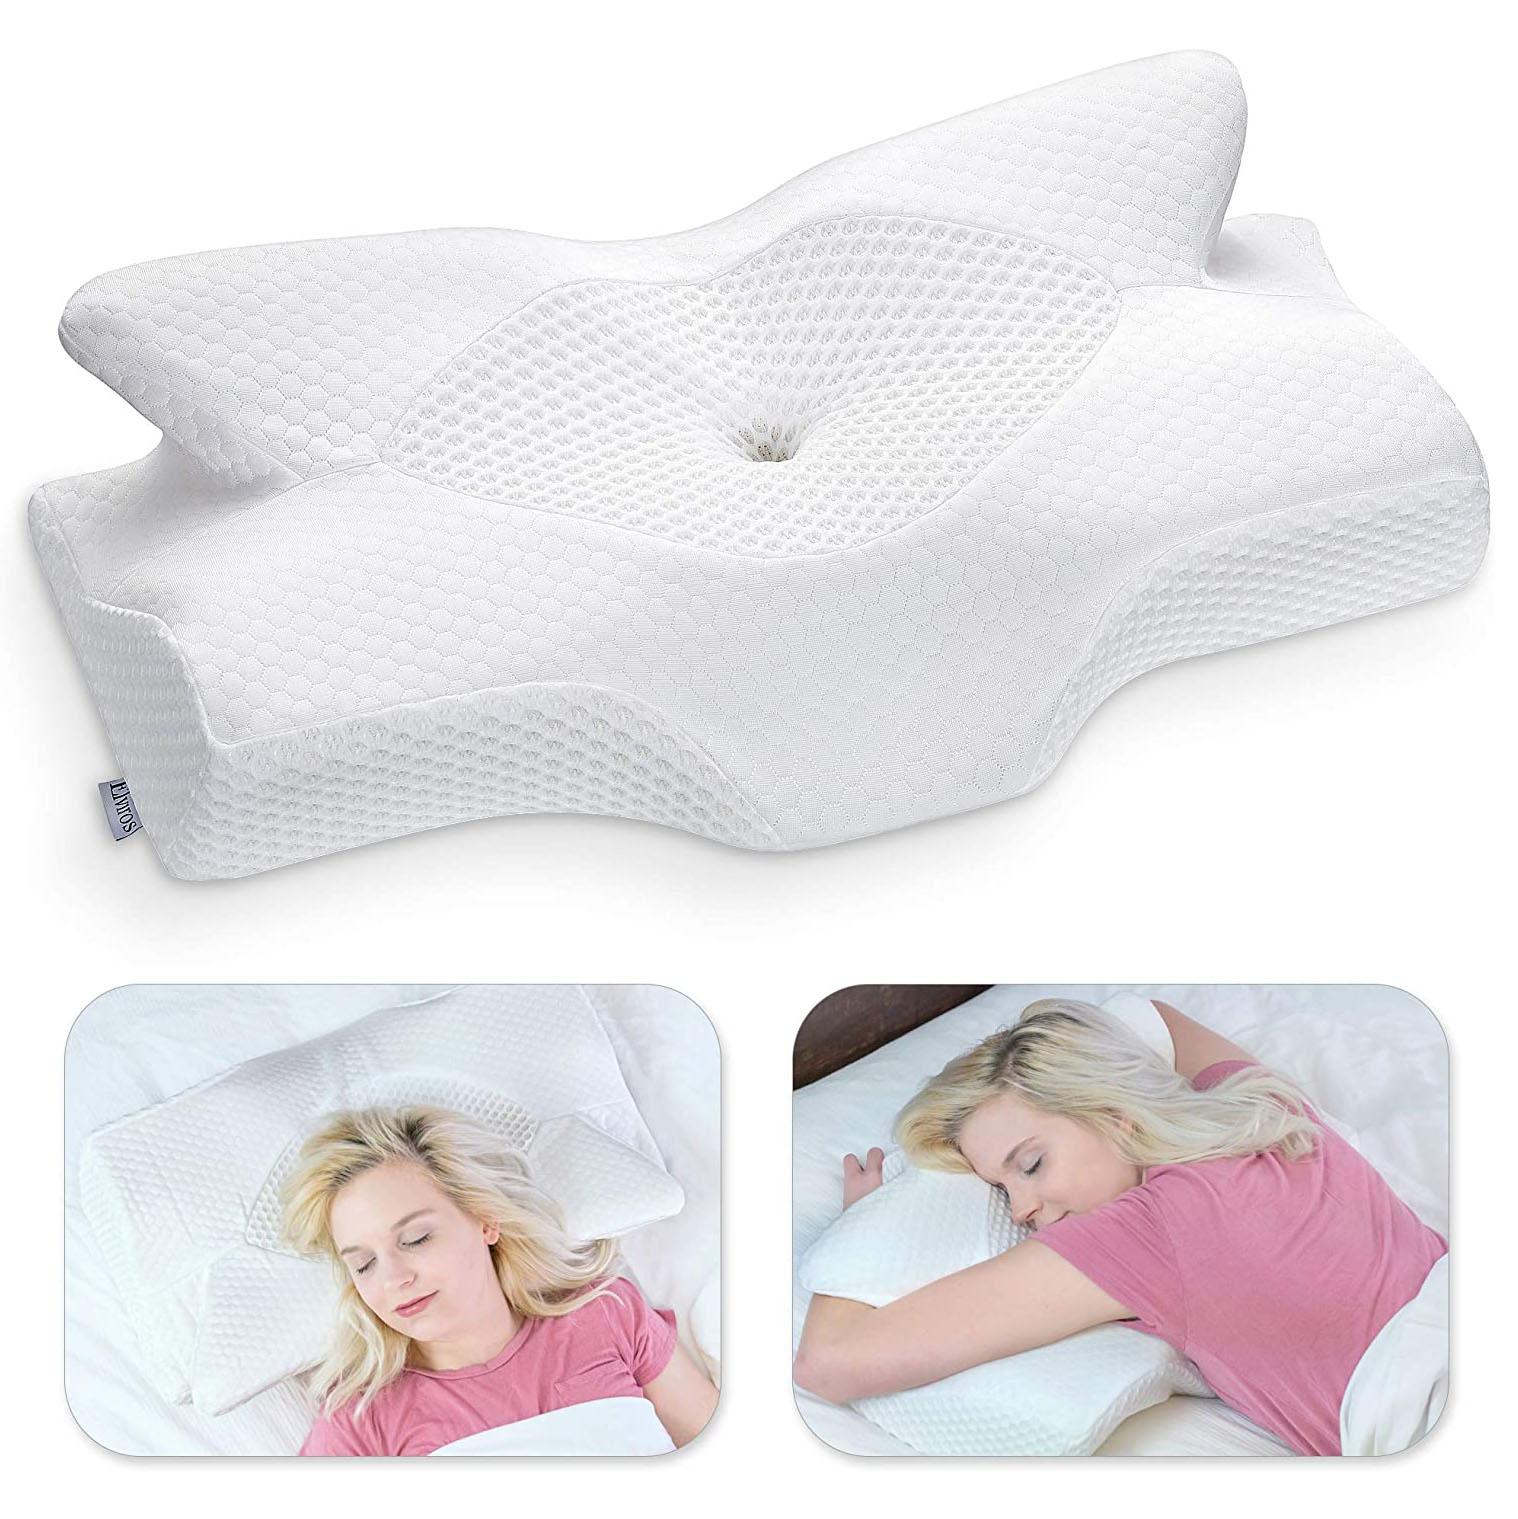 Elviros Cervical Memory Foam Pillow, best pillows for stomach sleepers